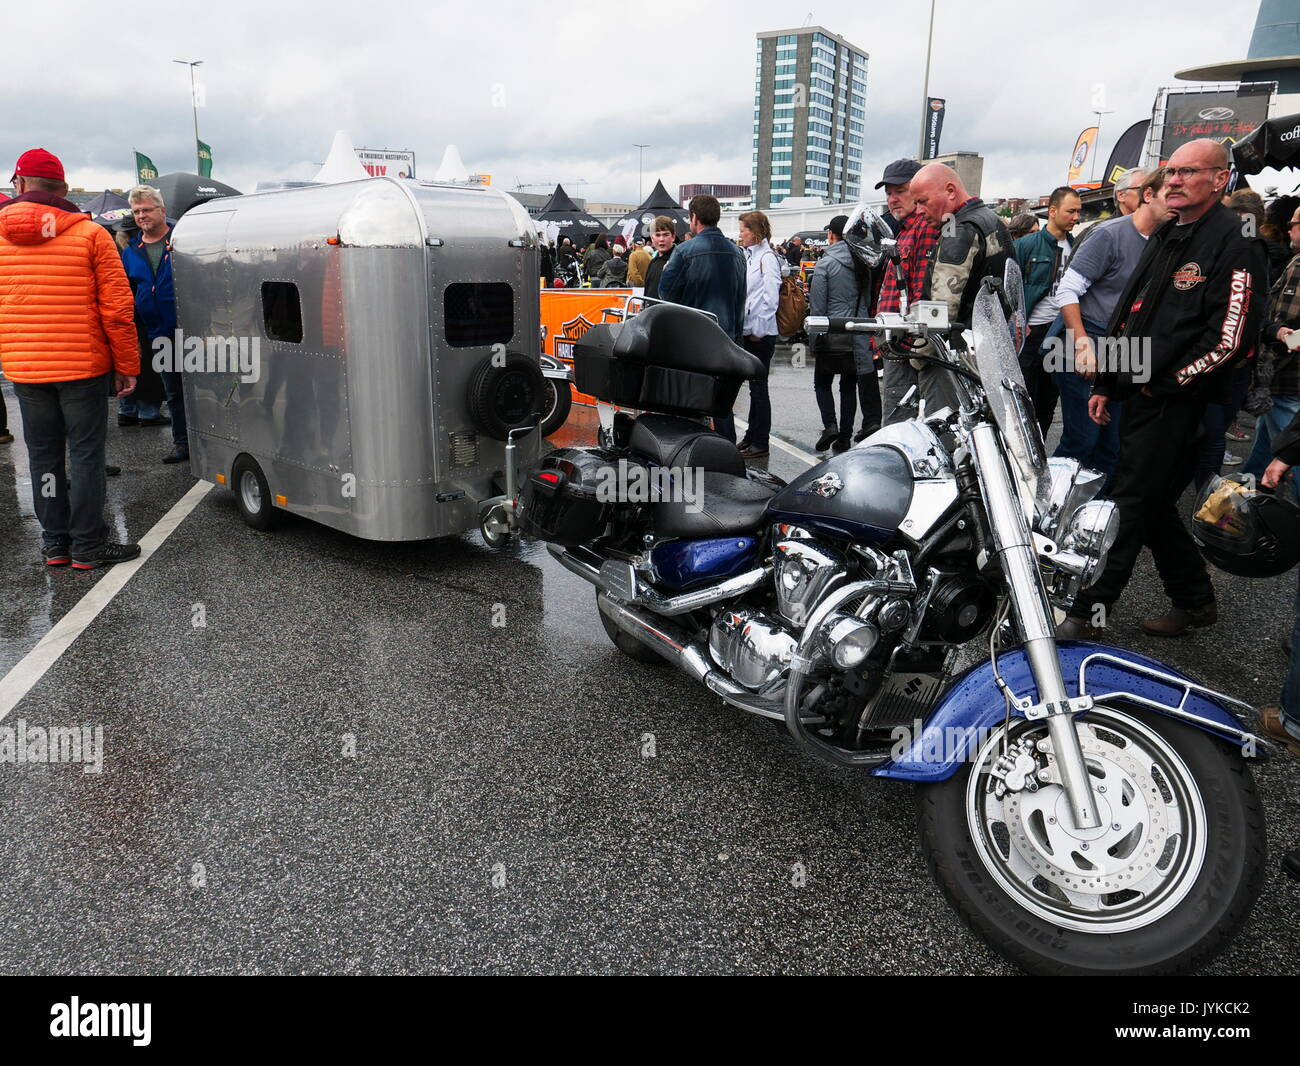 Hamburg Harley Days Biker-City-Event big motorbike motorbiker parade Germany Stock Photo